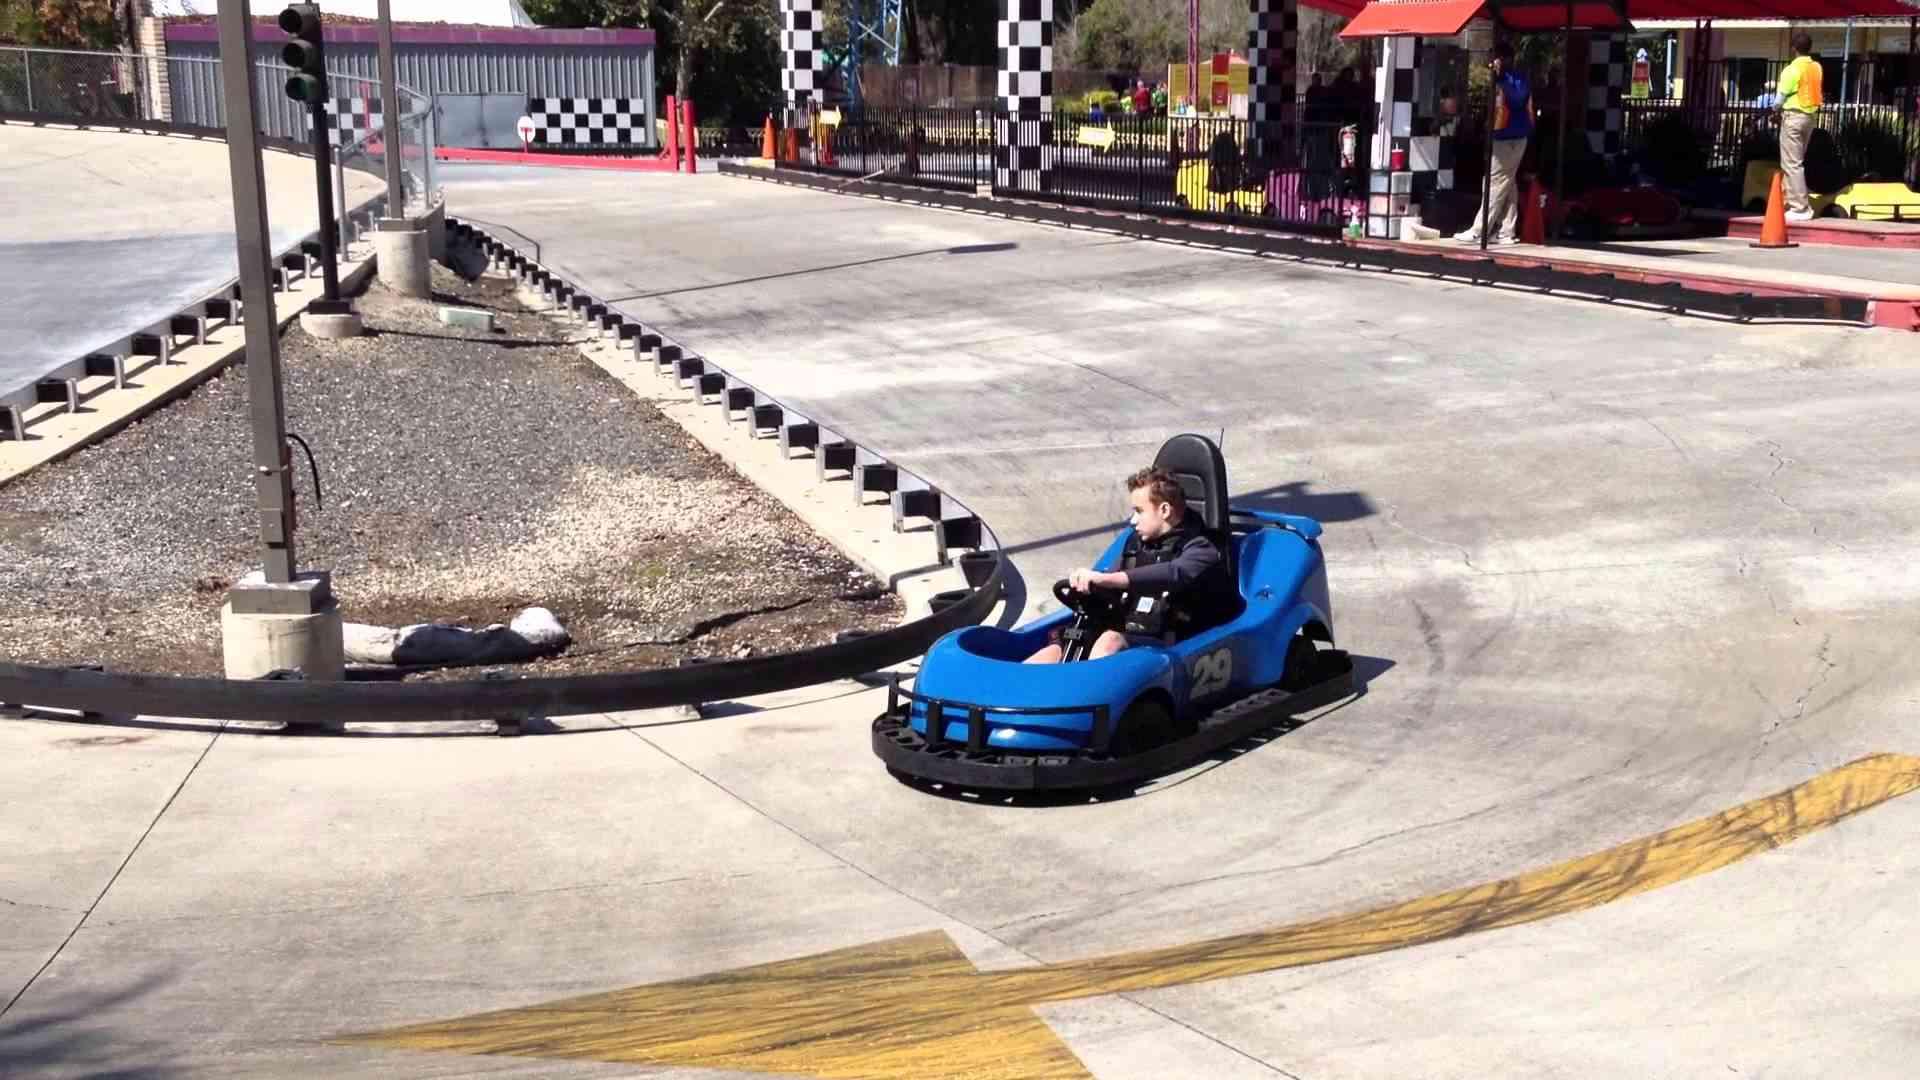 Kart Racing at Magic Mountain in Columbus